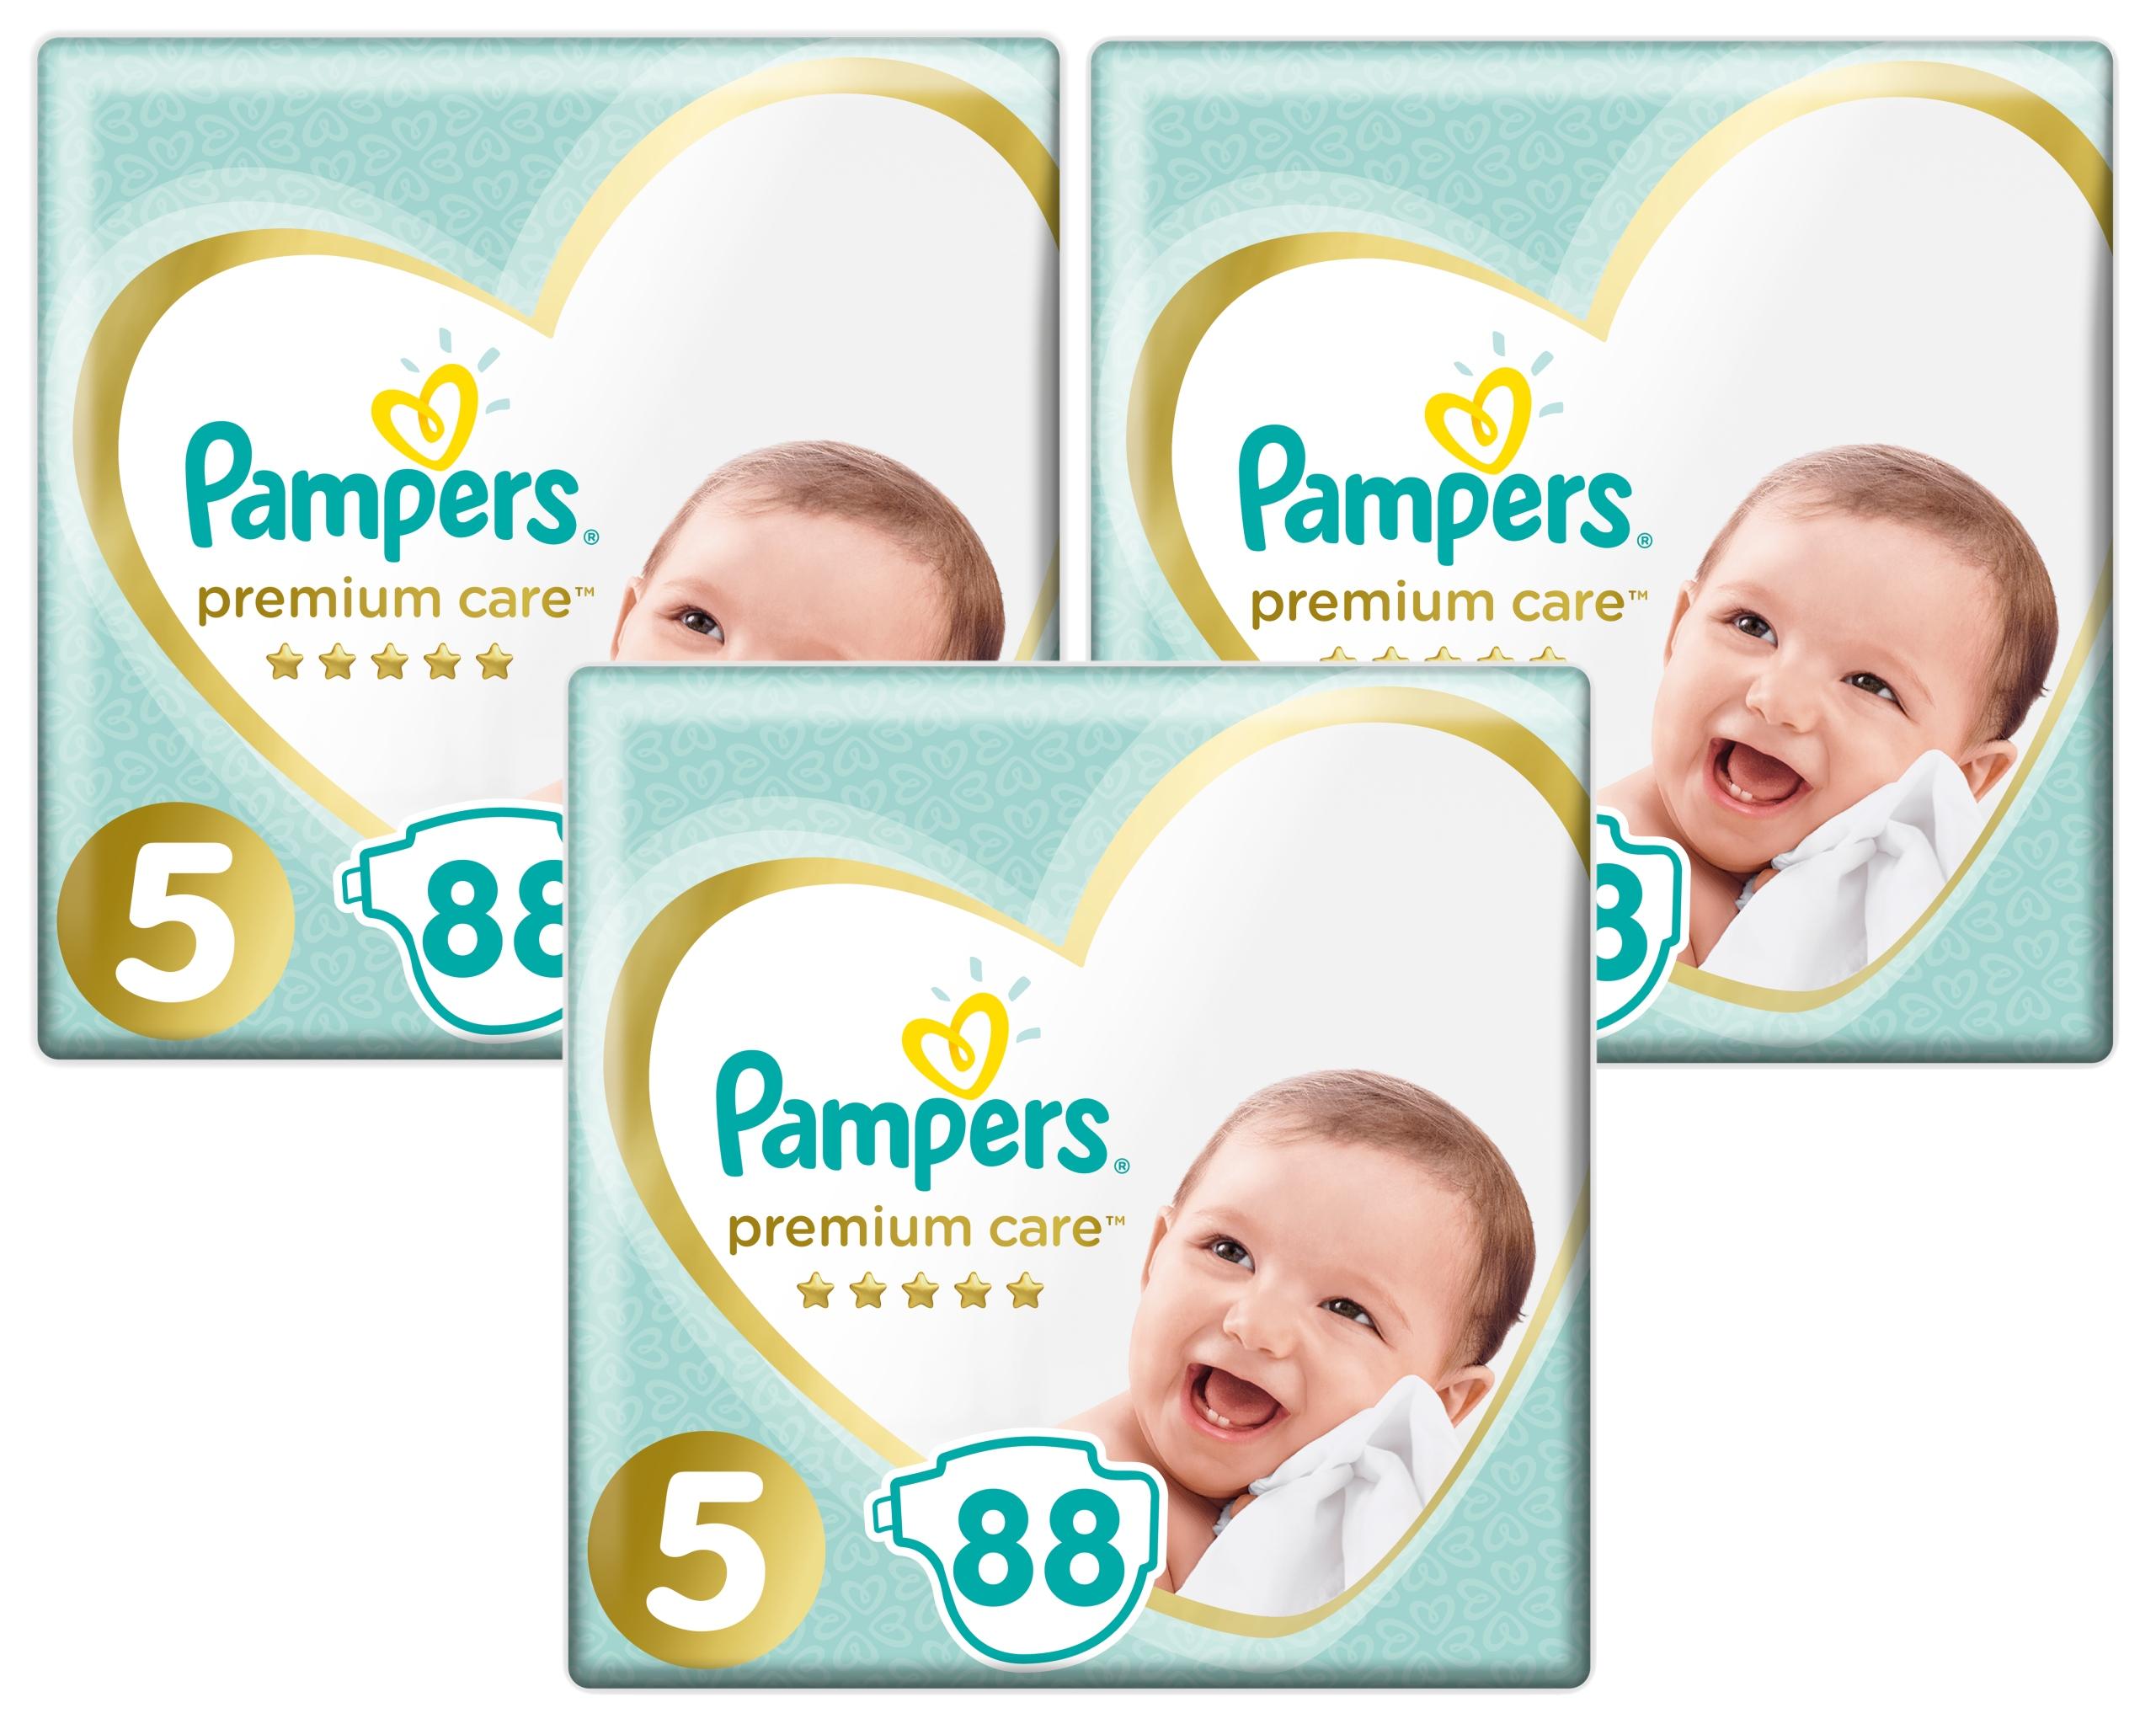 PAMPERS Pieluszki Premium Care 5 Junior 88 szt. X3 71 gr/szt